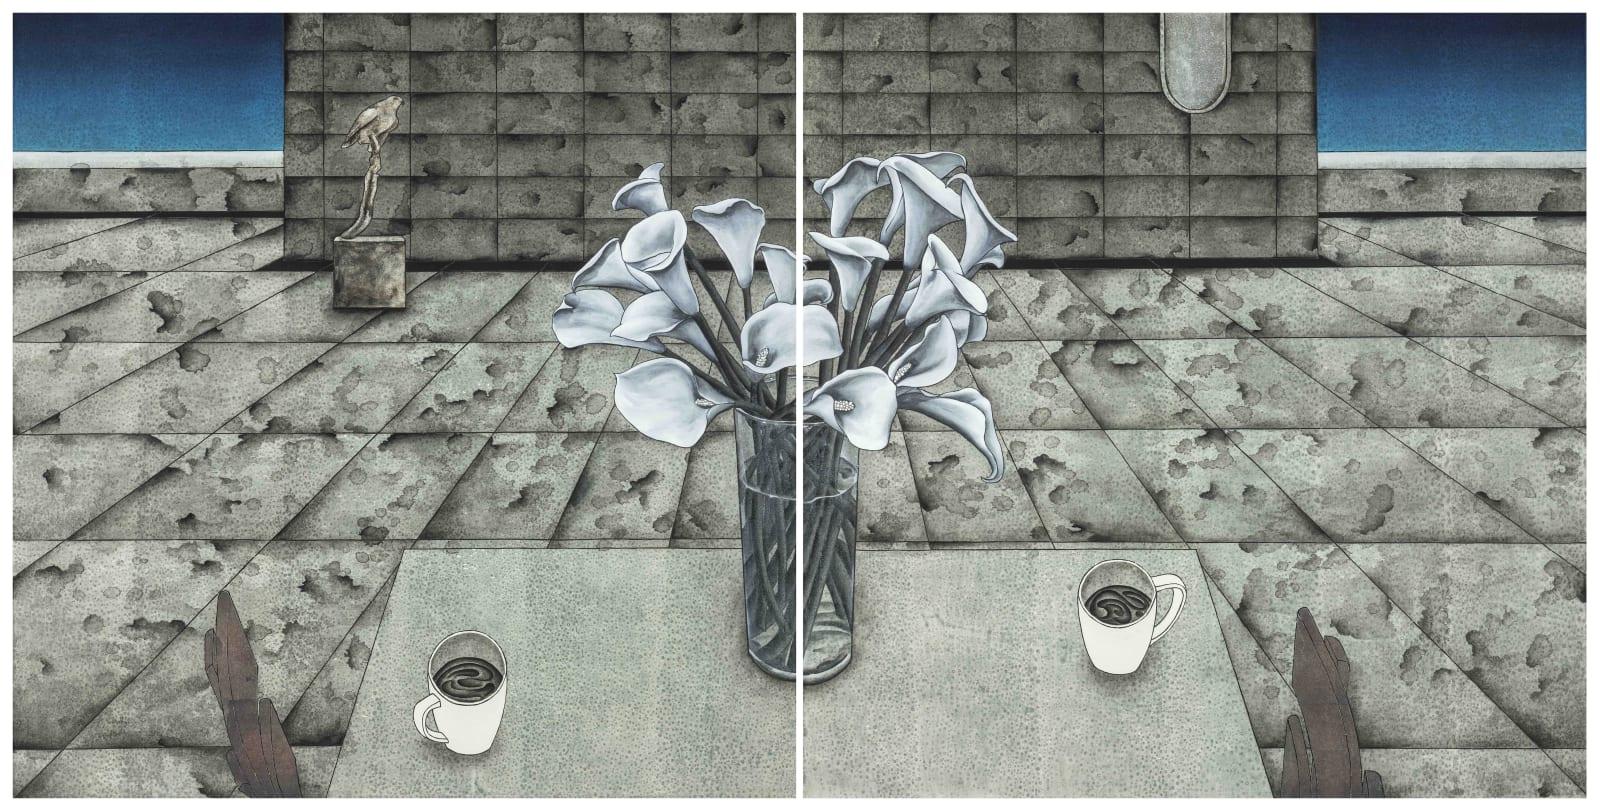 Yeh Jen-Kun 葉仁焜, Those Unsaid Words 那些沒說的話, 2015